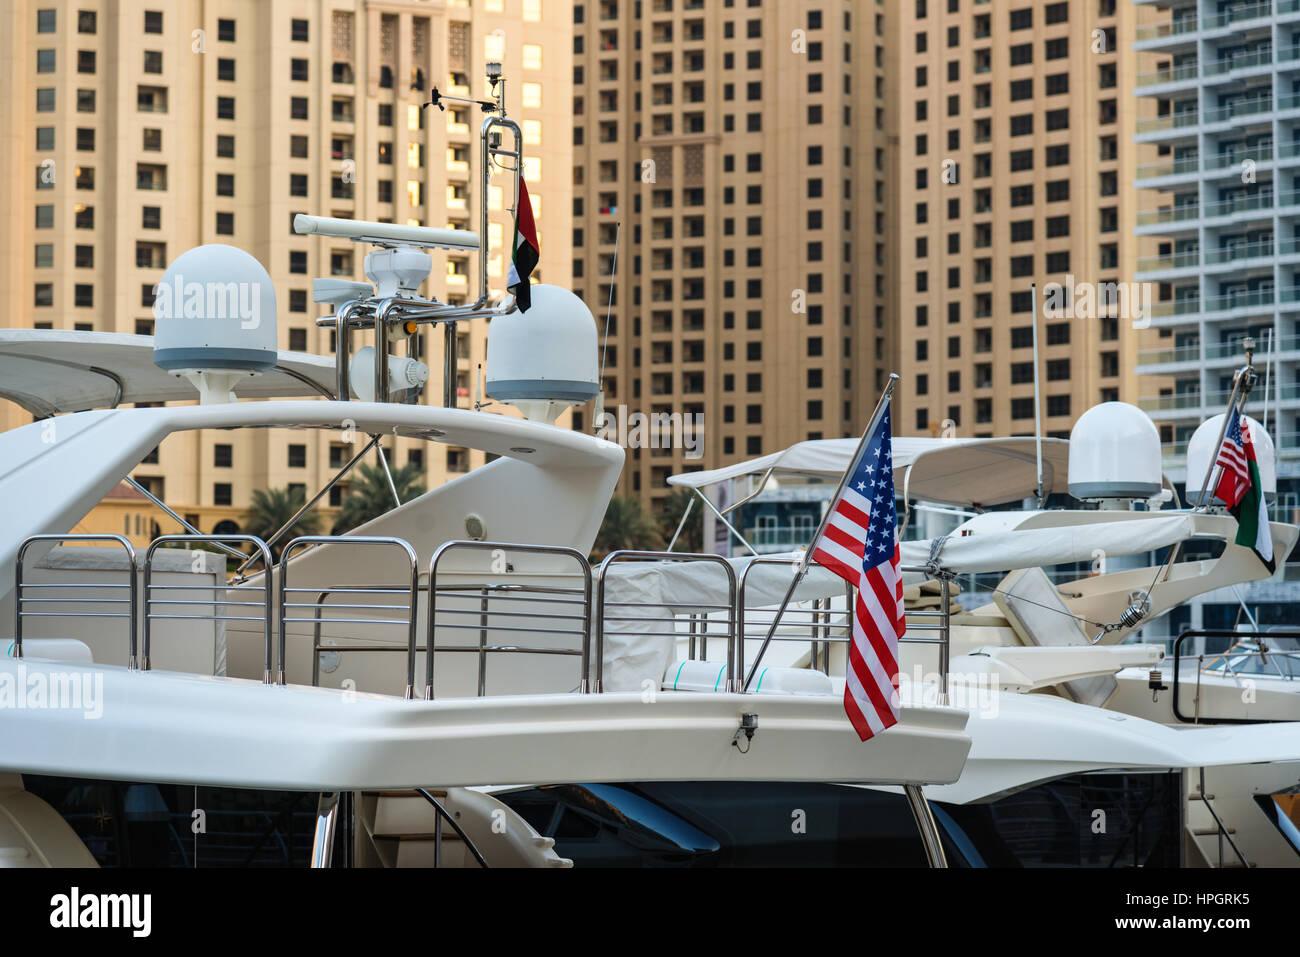 Modern yachts in harbor in megapolis - Stock Image